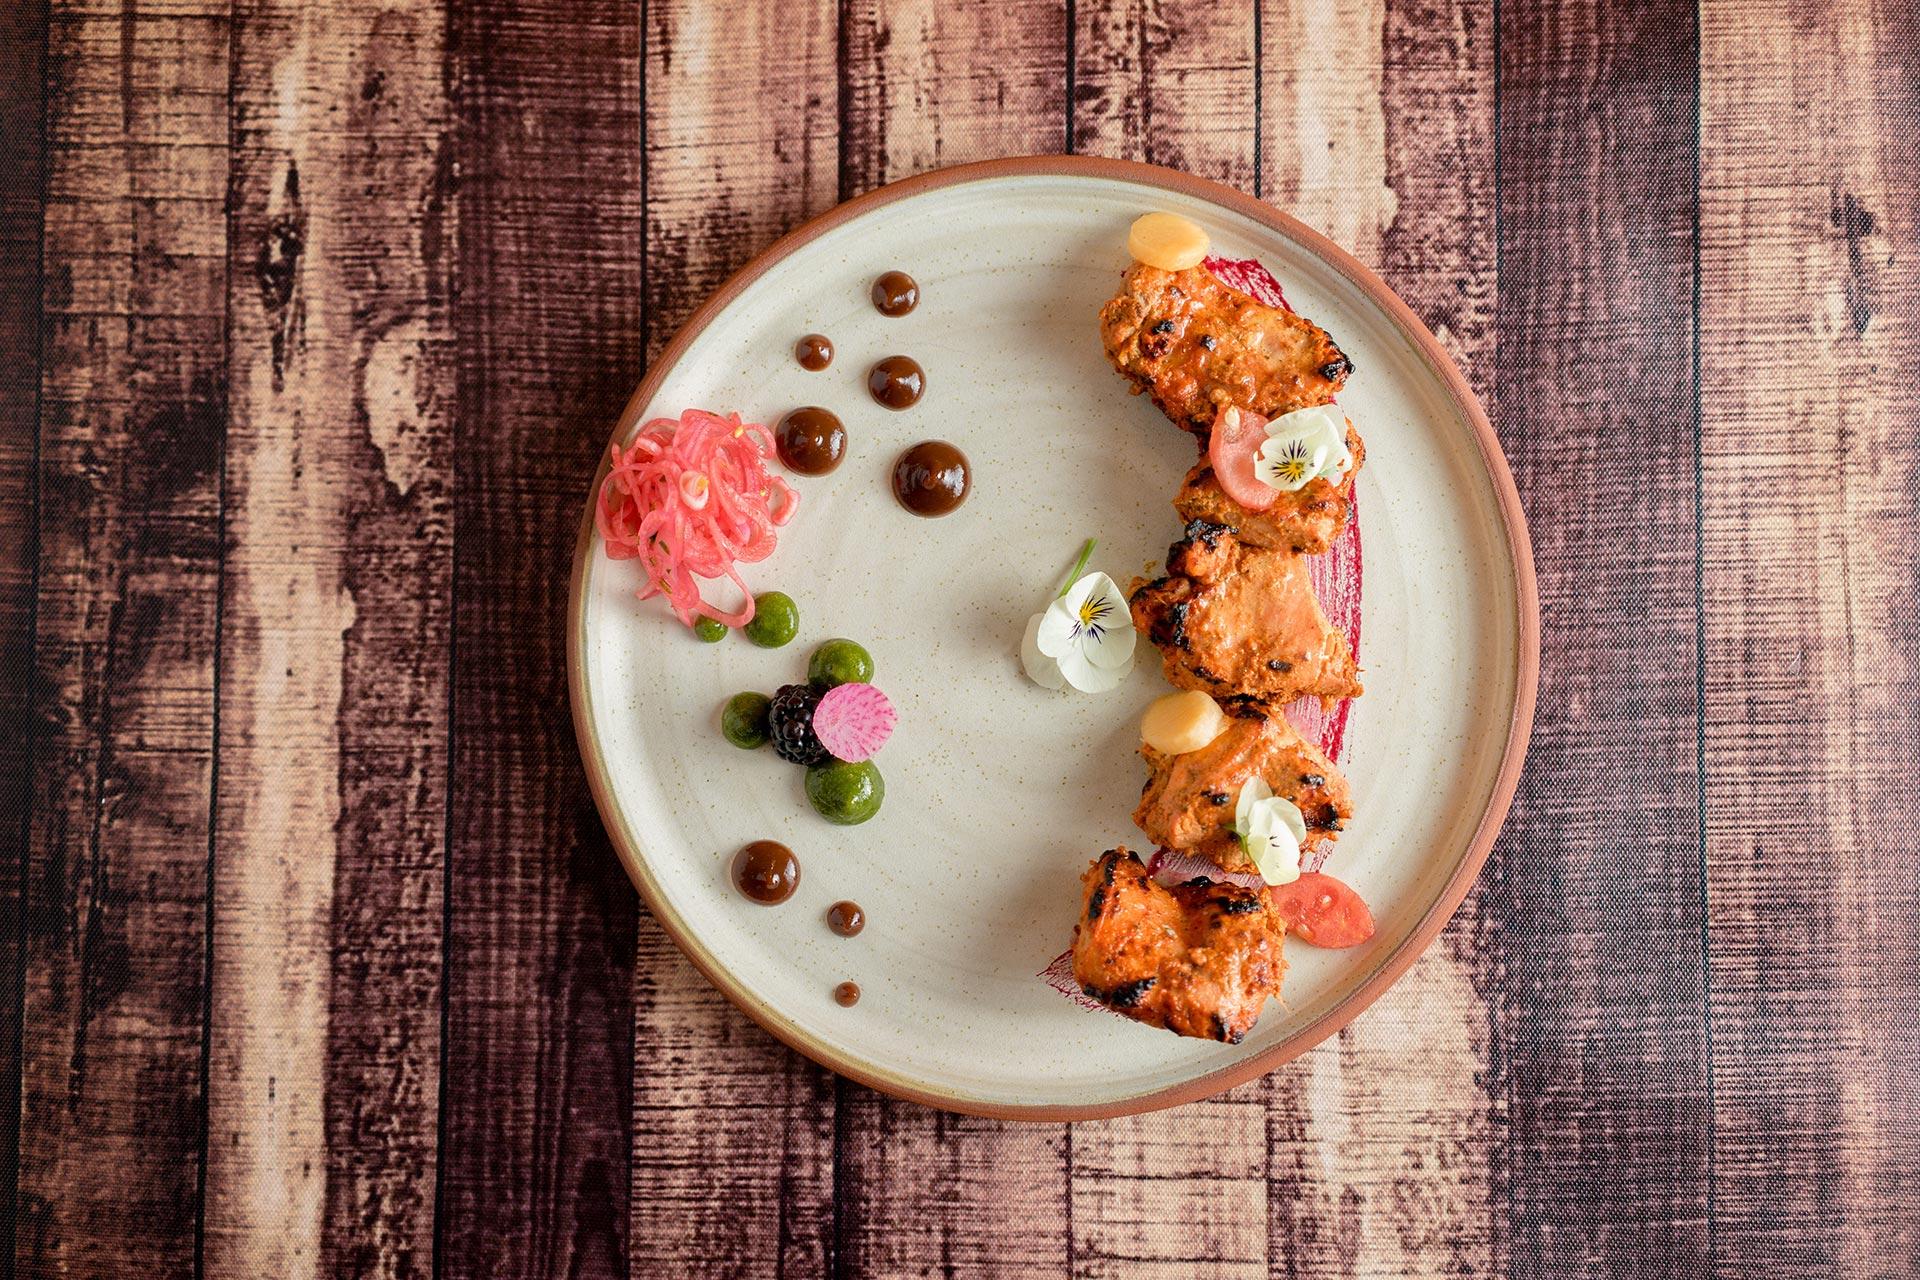 san-francisco-restaurant-food-photographer-a-few-good-clicks-net-81.jpg